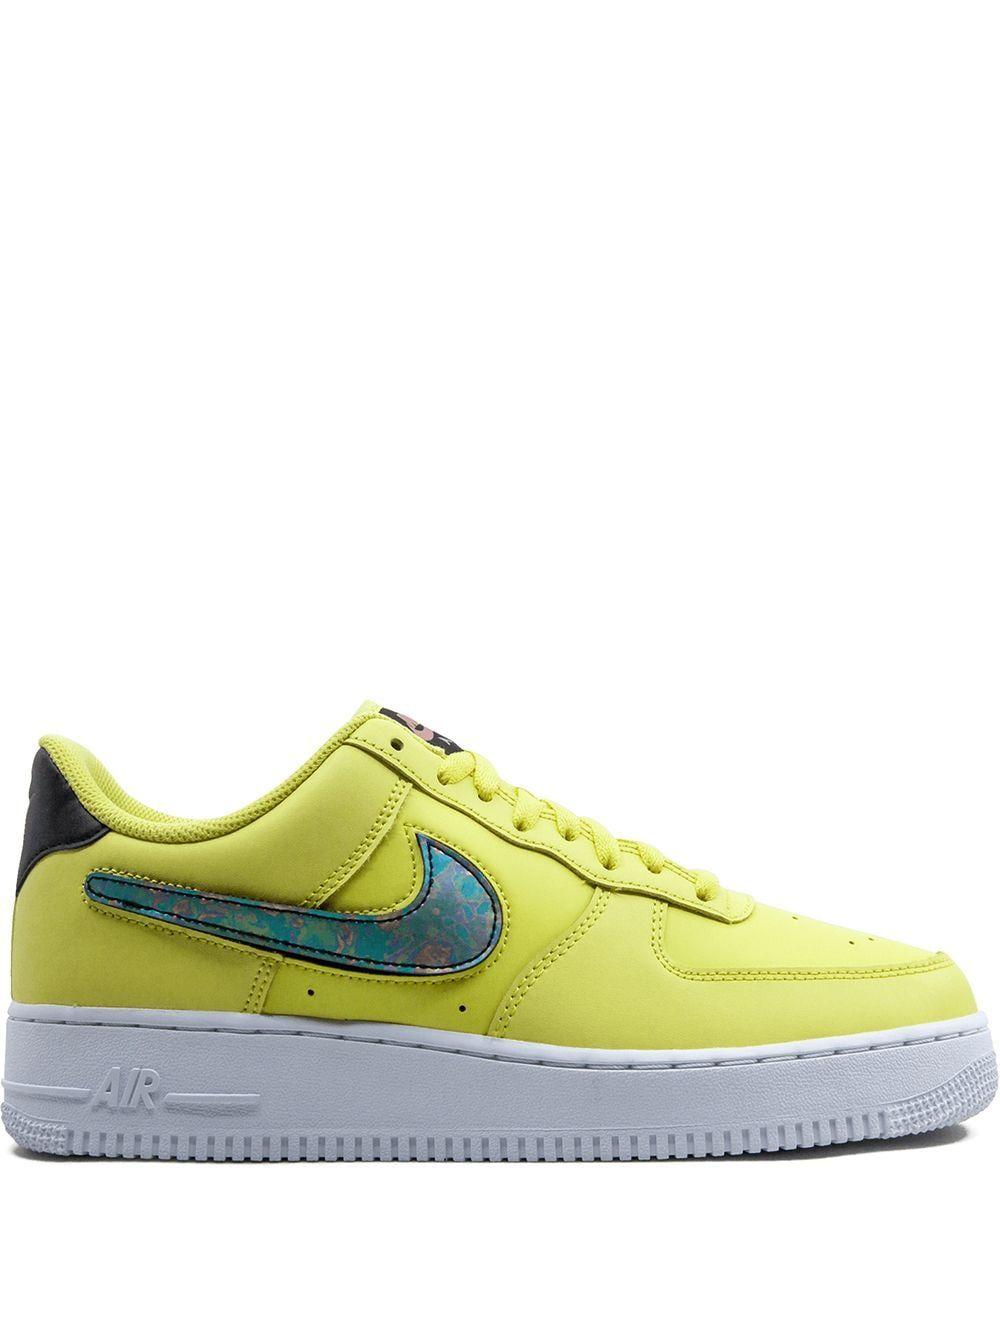 Angebot Special von Nike Schuhe Sale: Nike Air Force 1 07